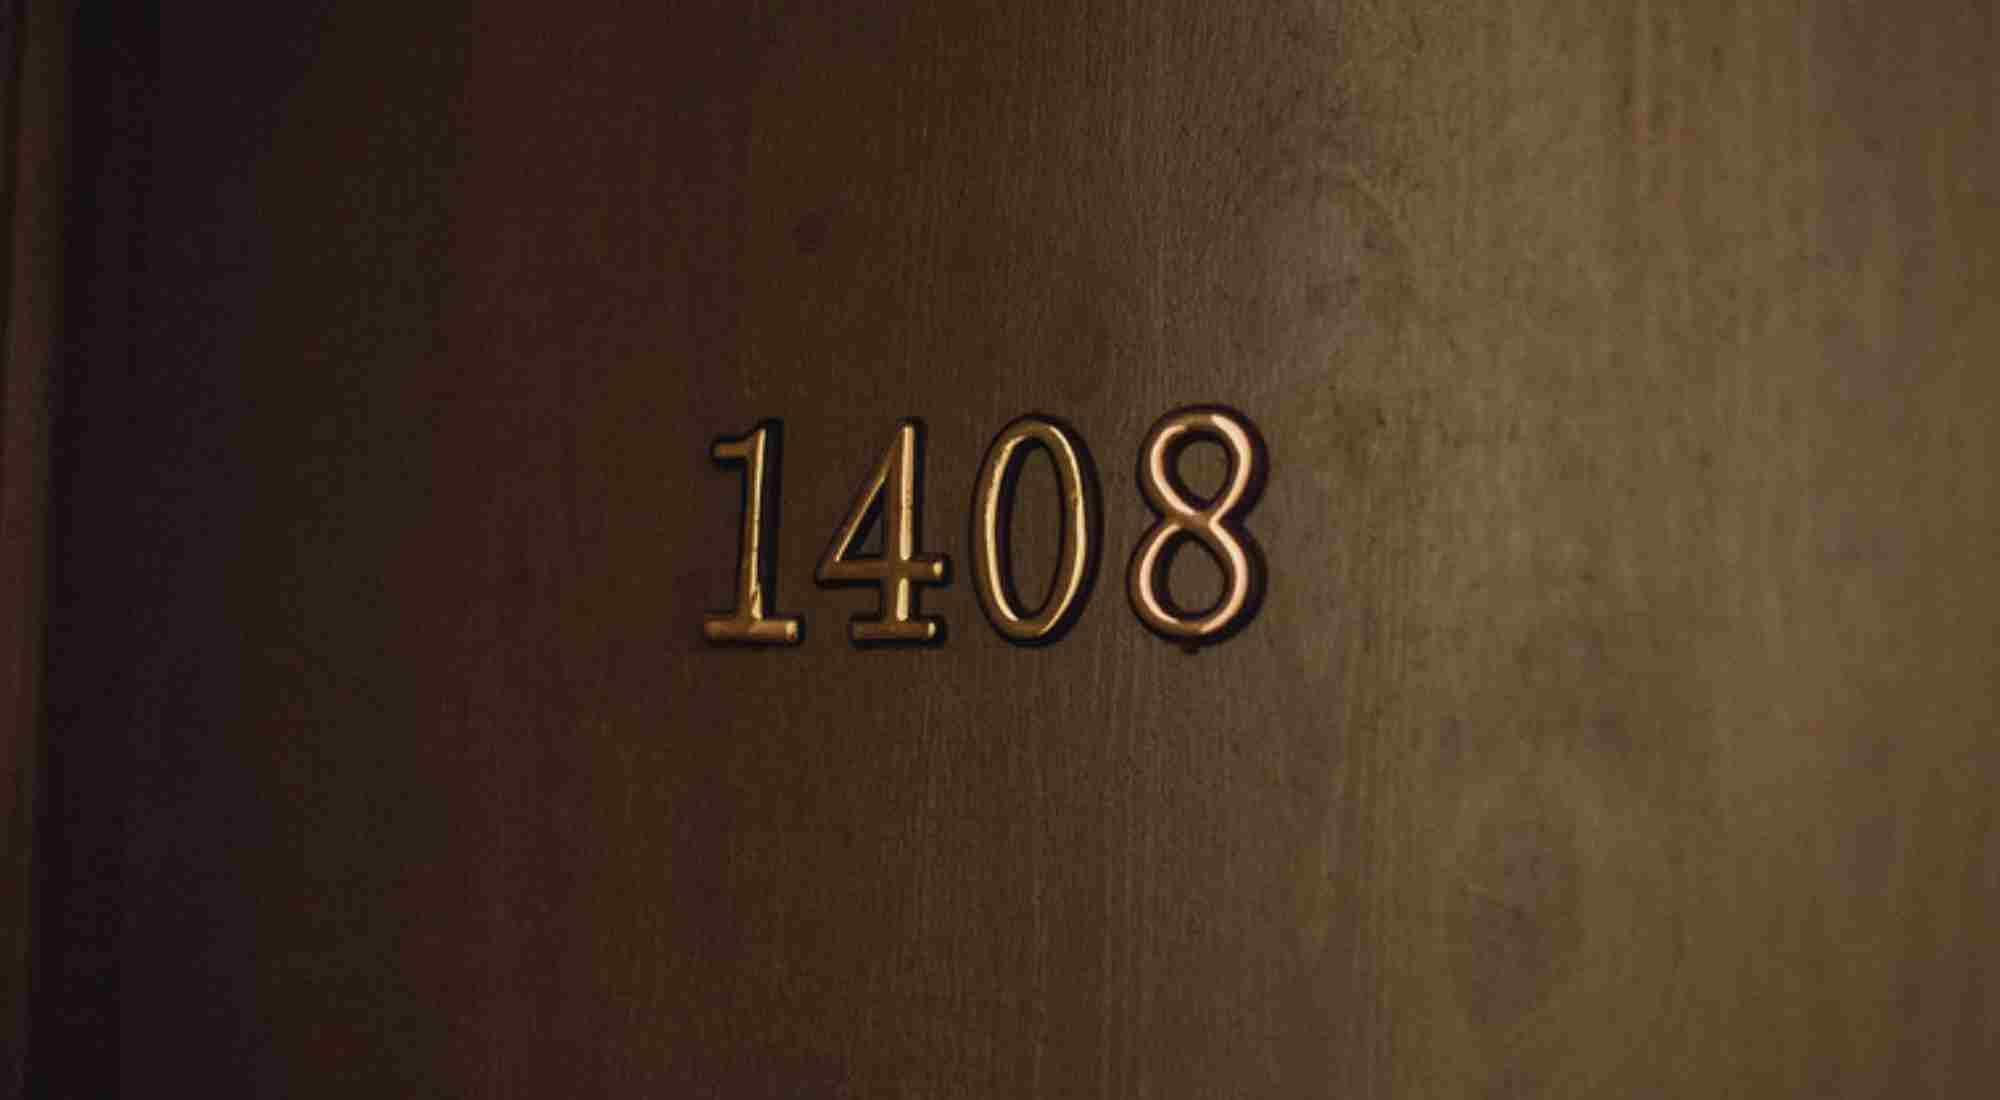 Квест 1408 в Набережных Челнах фото 5